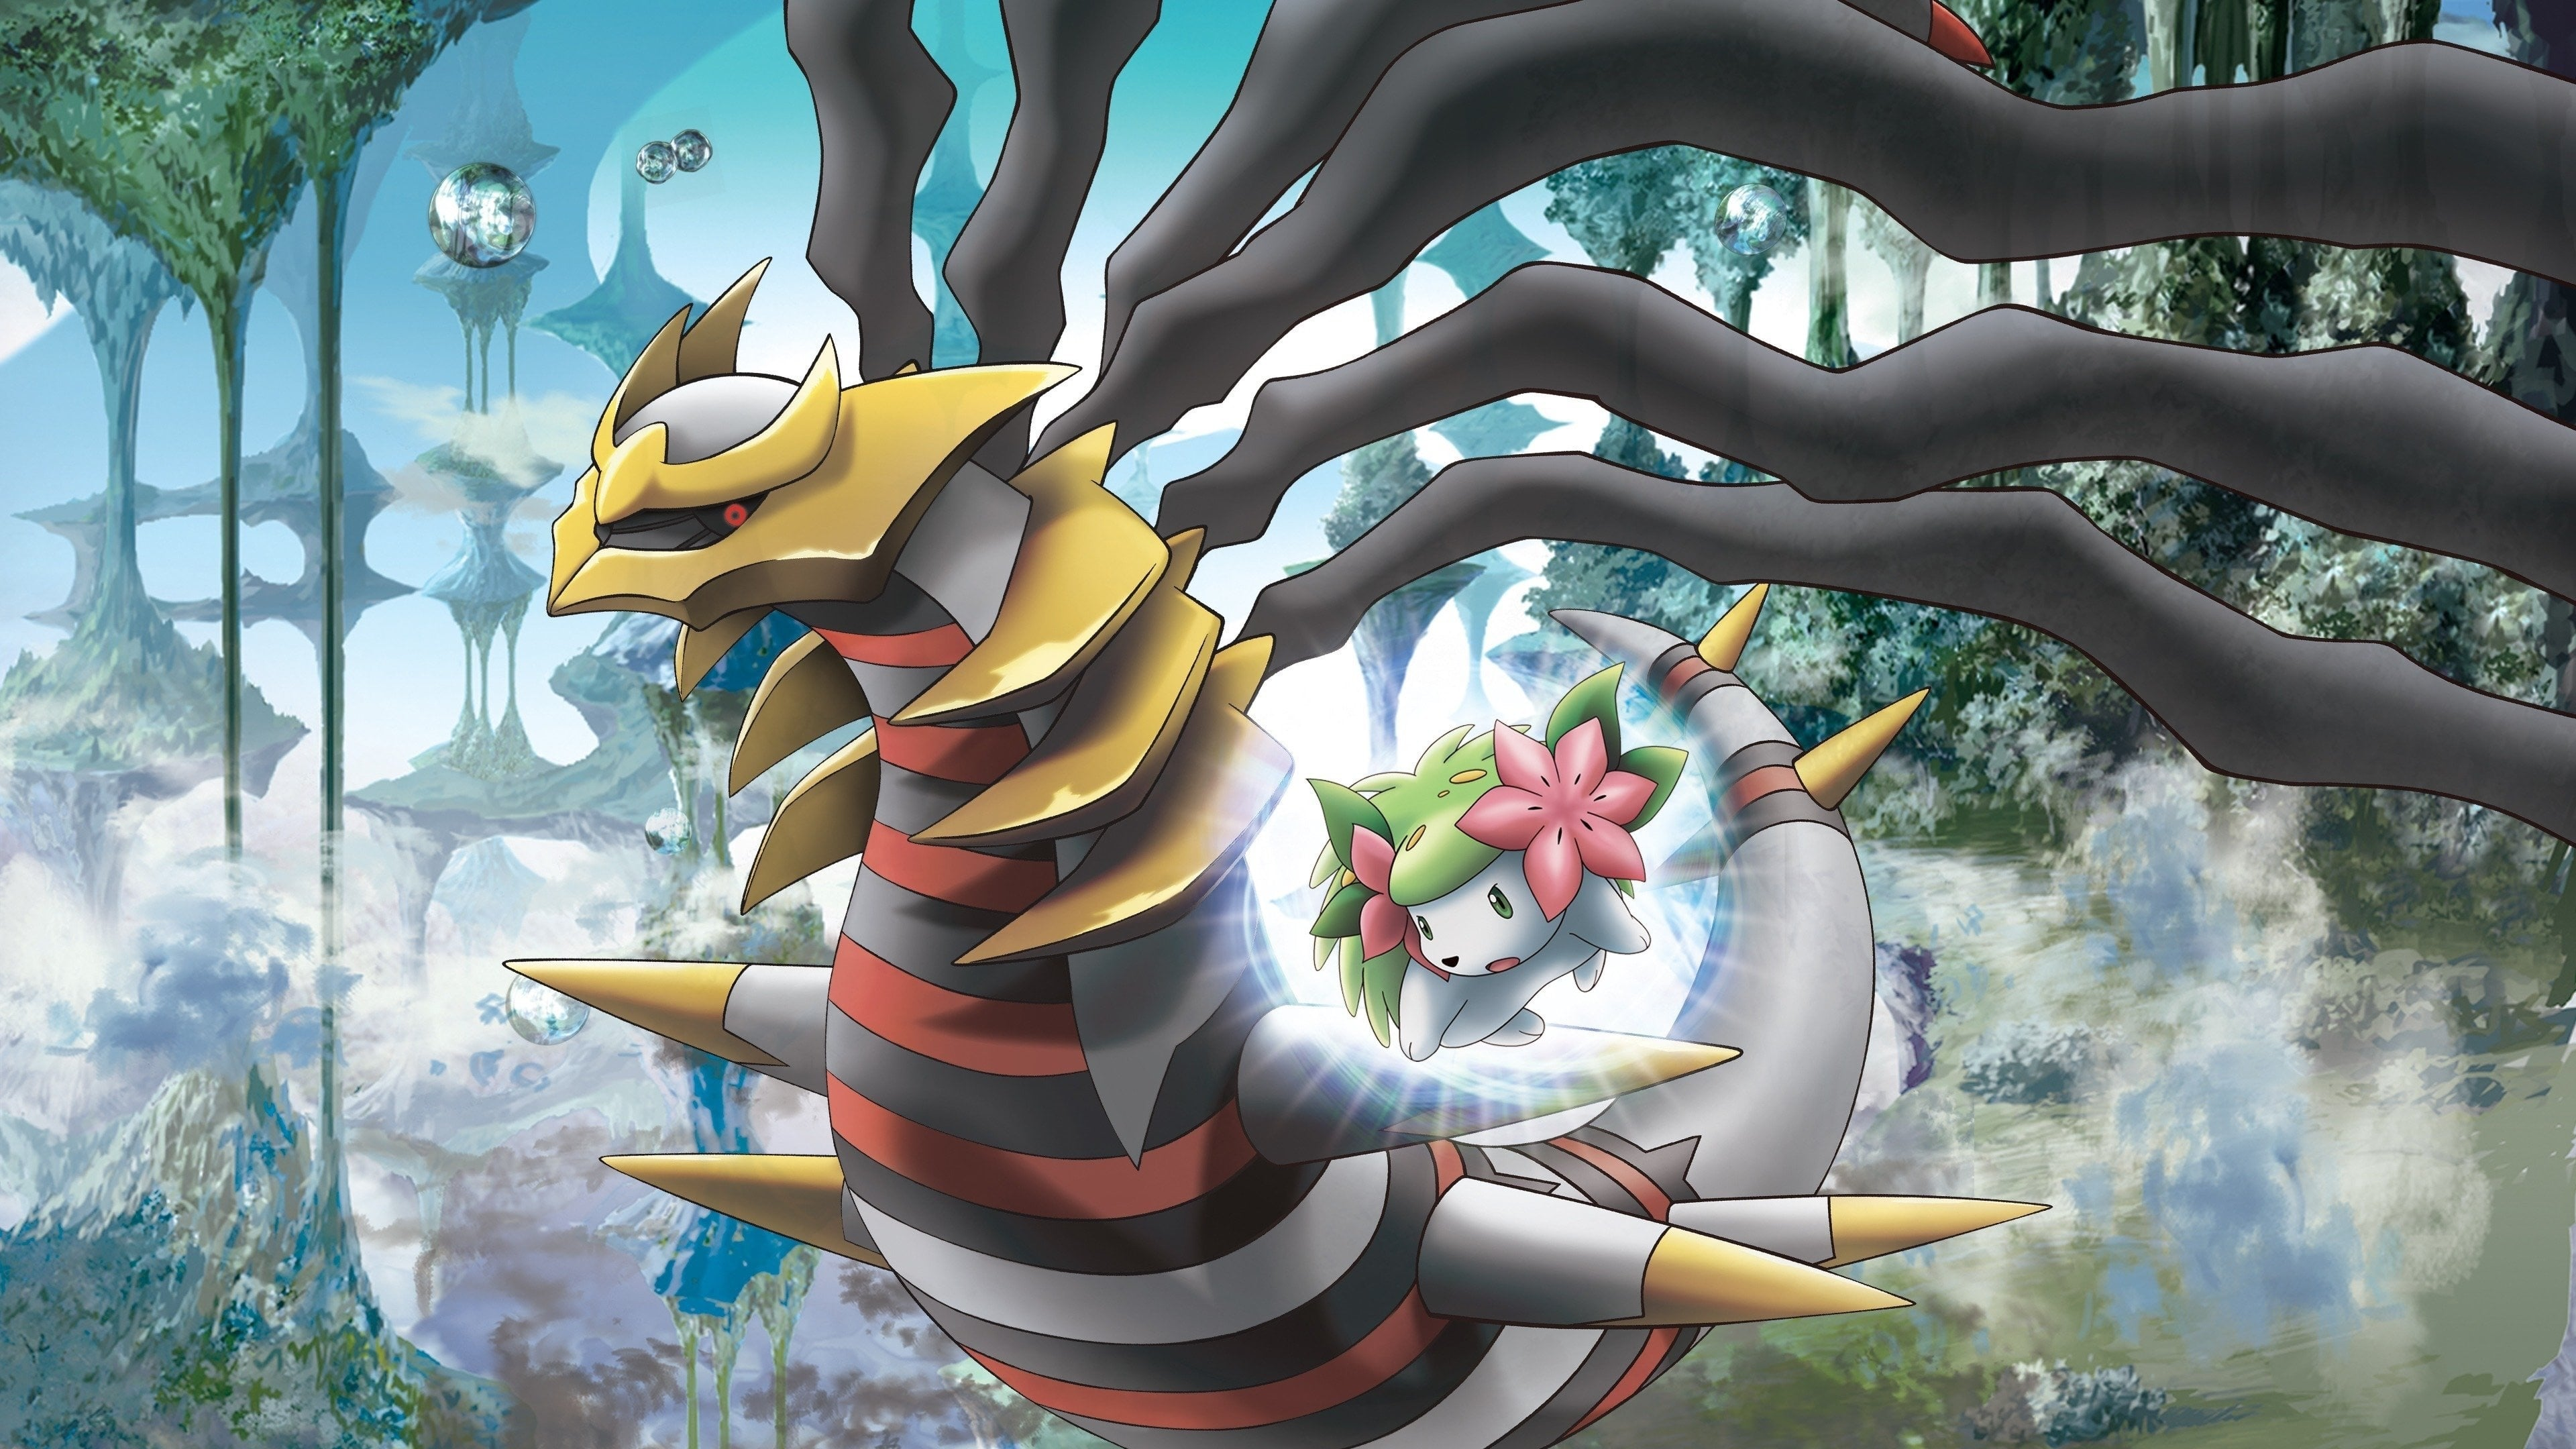 Pokémon: Giratina and the Sky Warrior Movie